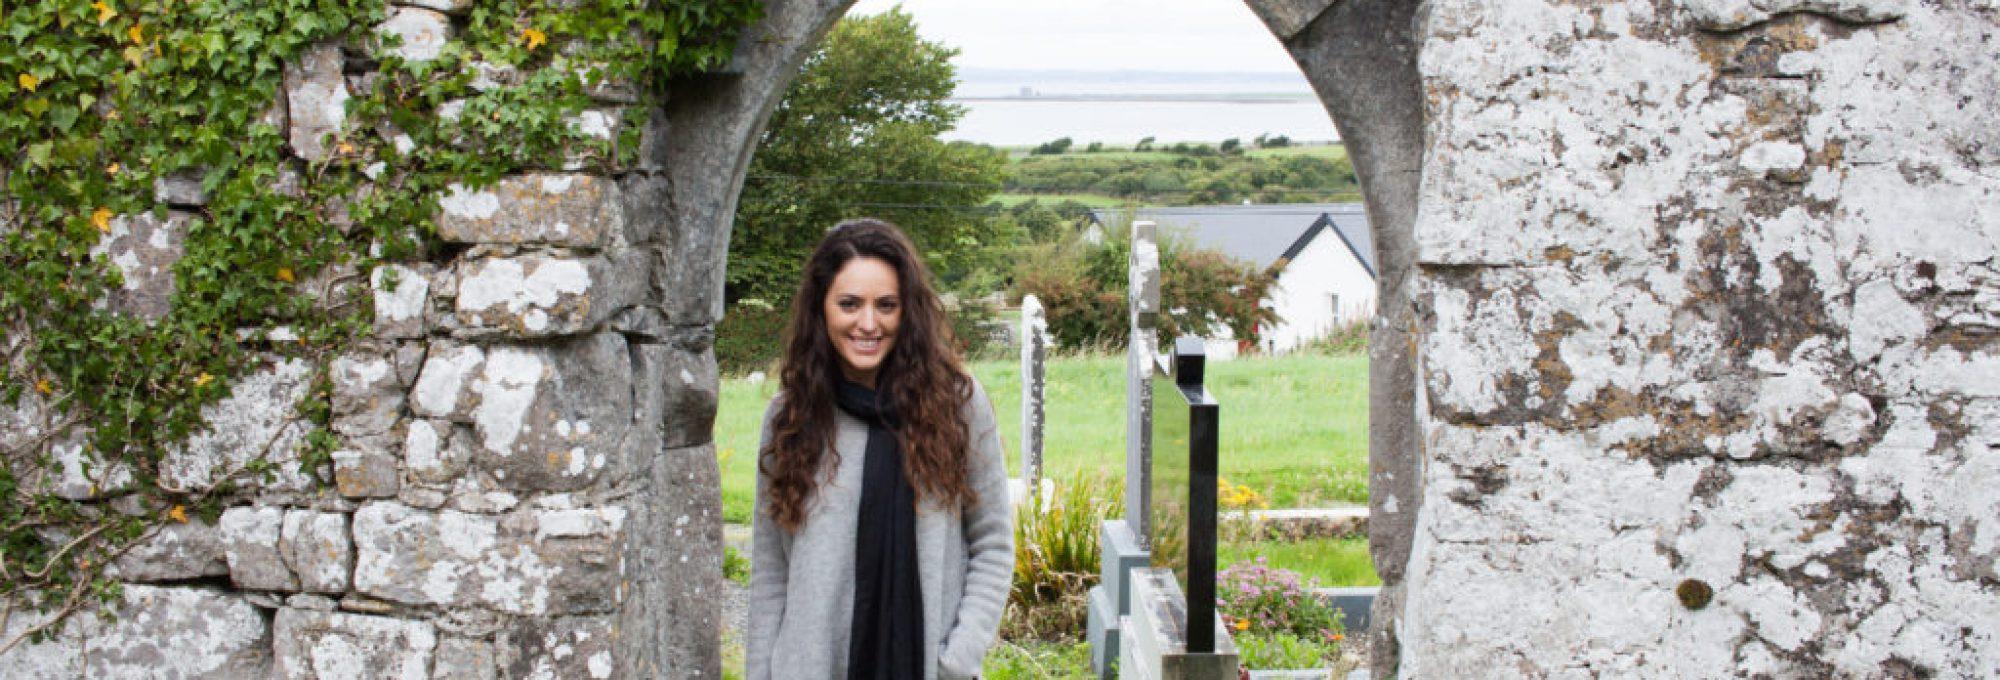 western ireland roadtrip, western ireland countryside, irish cottage, abandoned castle, fir trees, Galway, irish castles